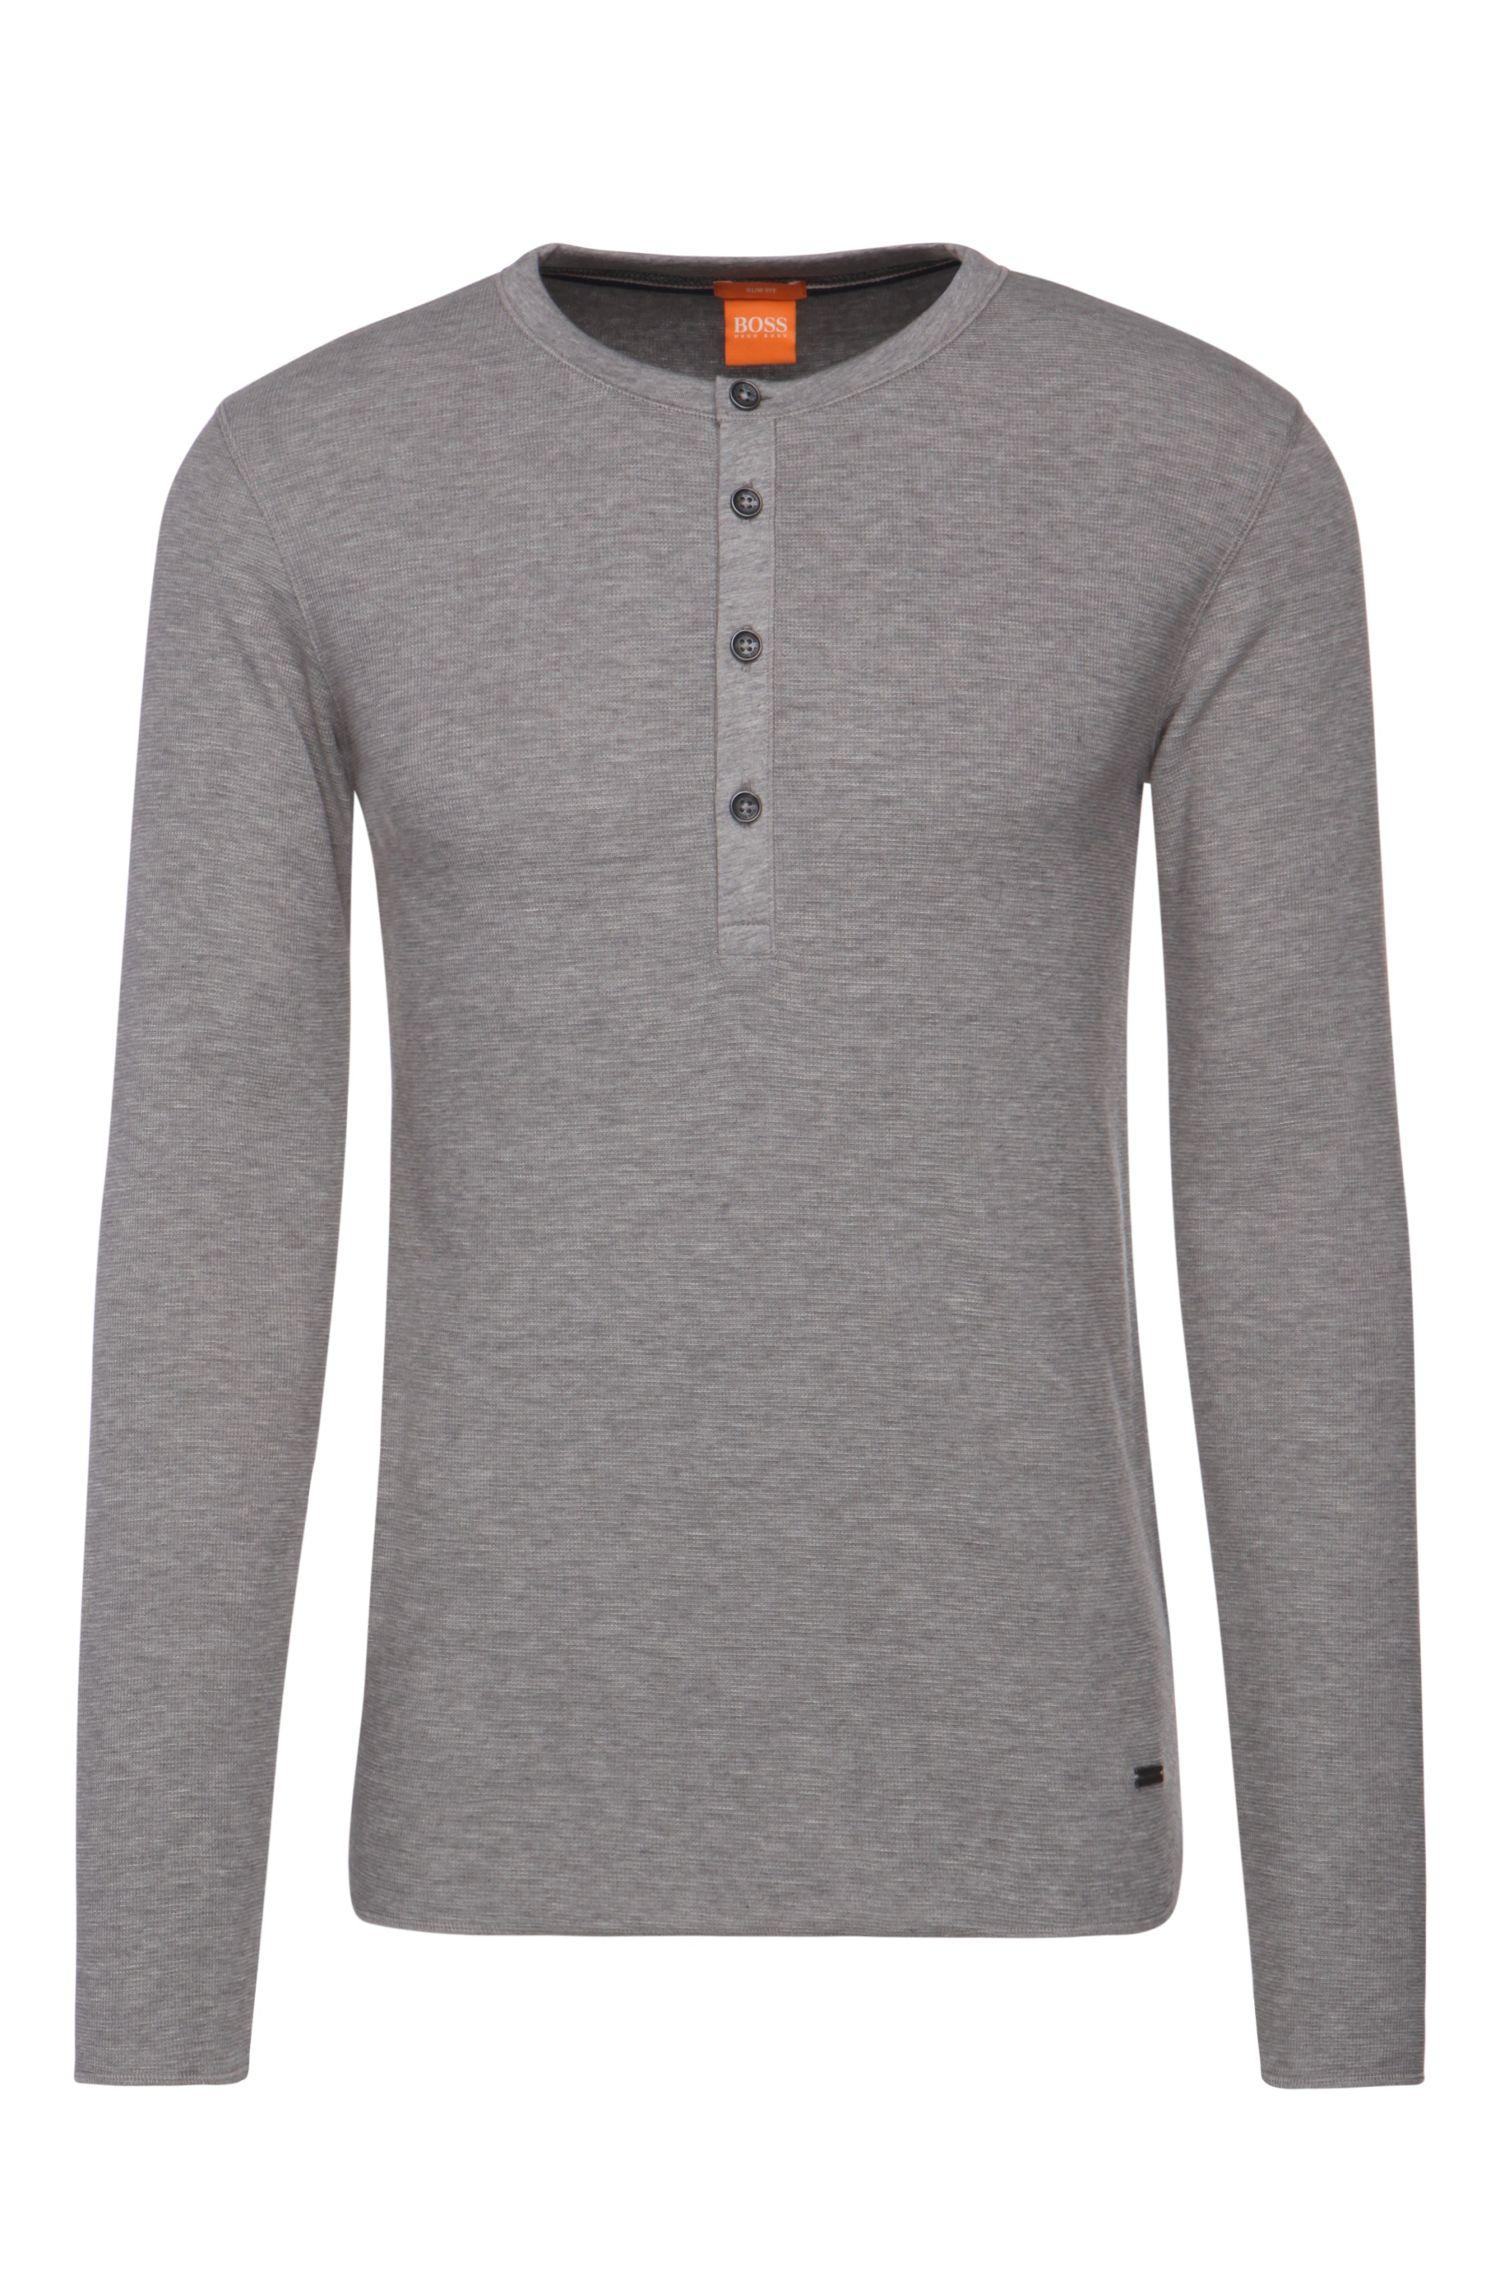 'Topsider' | Cotton Waffle Knit Henley Shirt